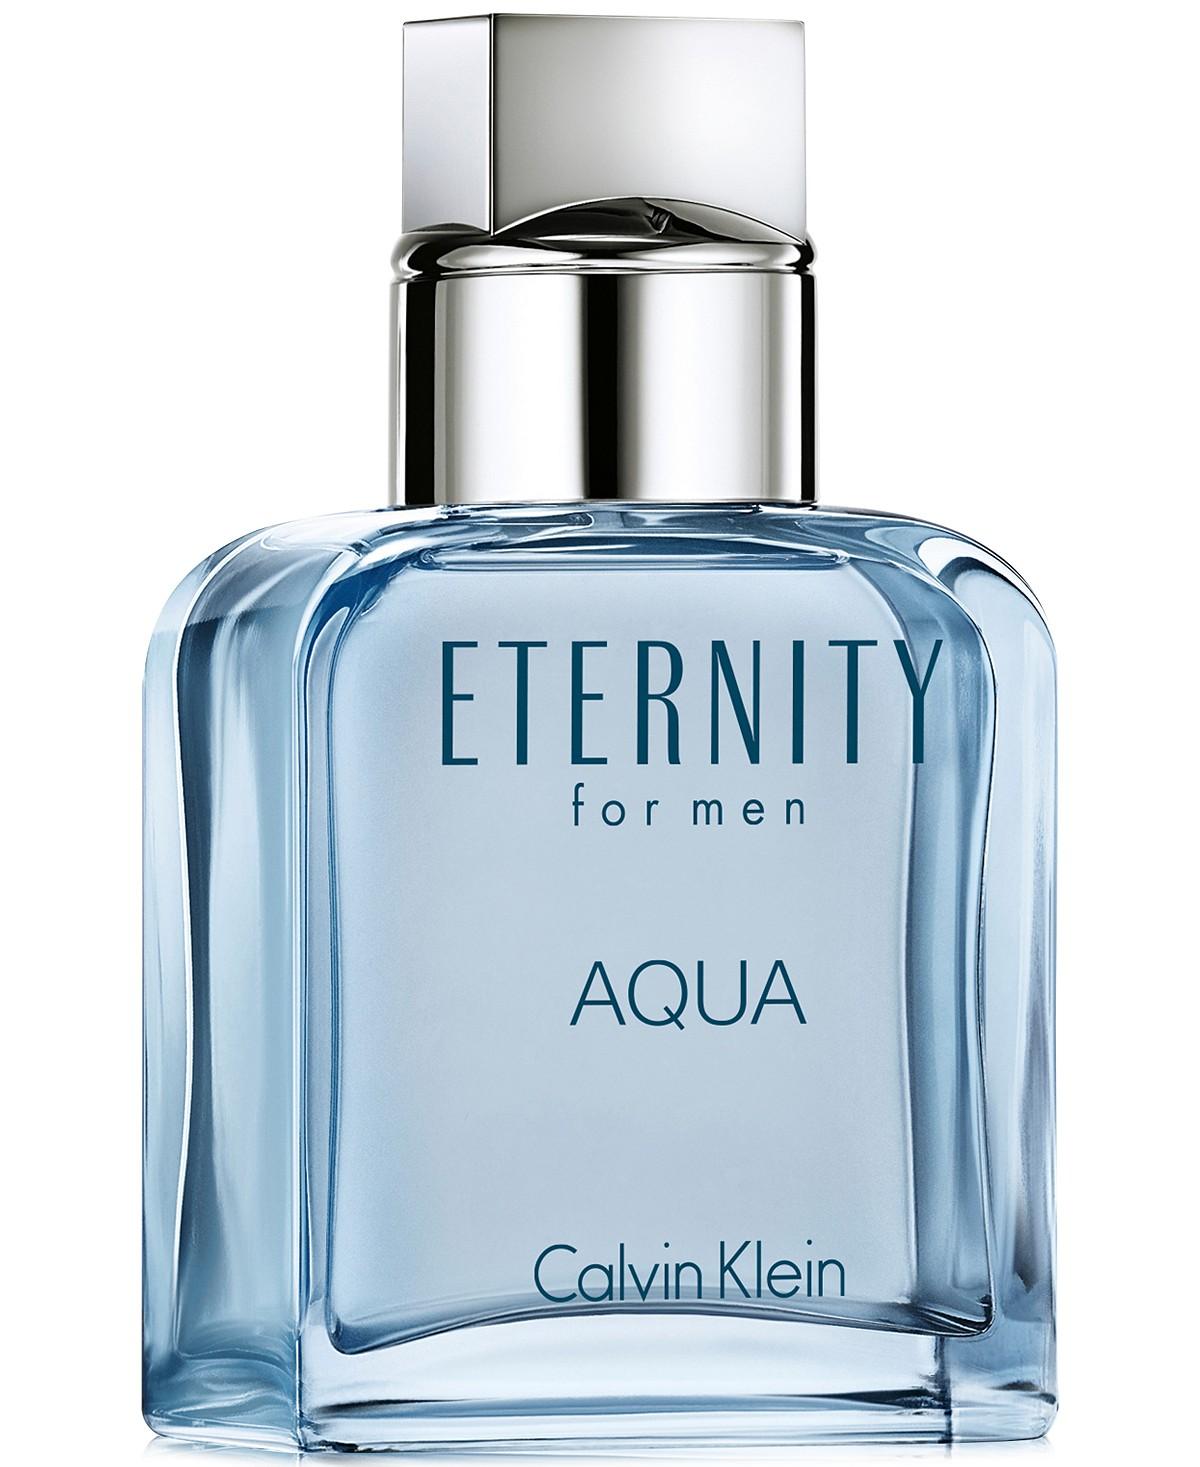 eternity aqua for men calvin klein cologne ein es parfum f r m nner 2010. Black Bedroom Furniture Sets. Home Design Ideas